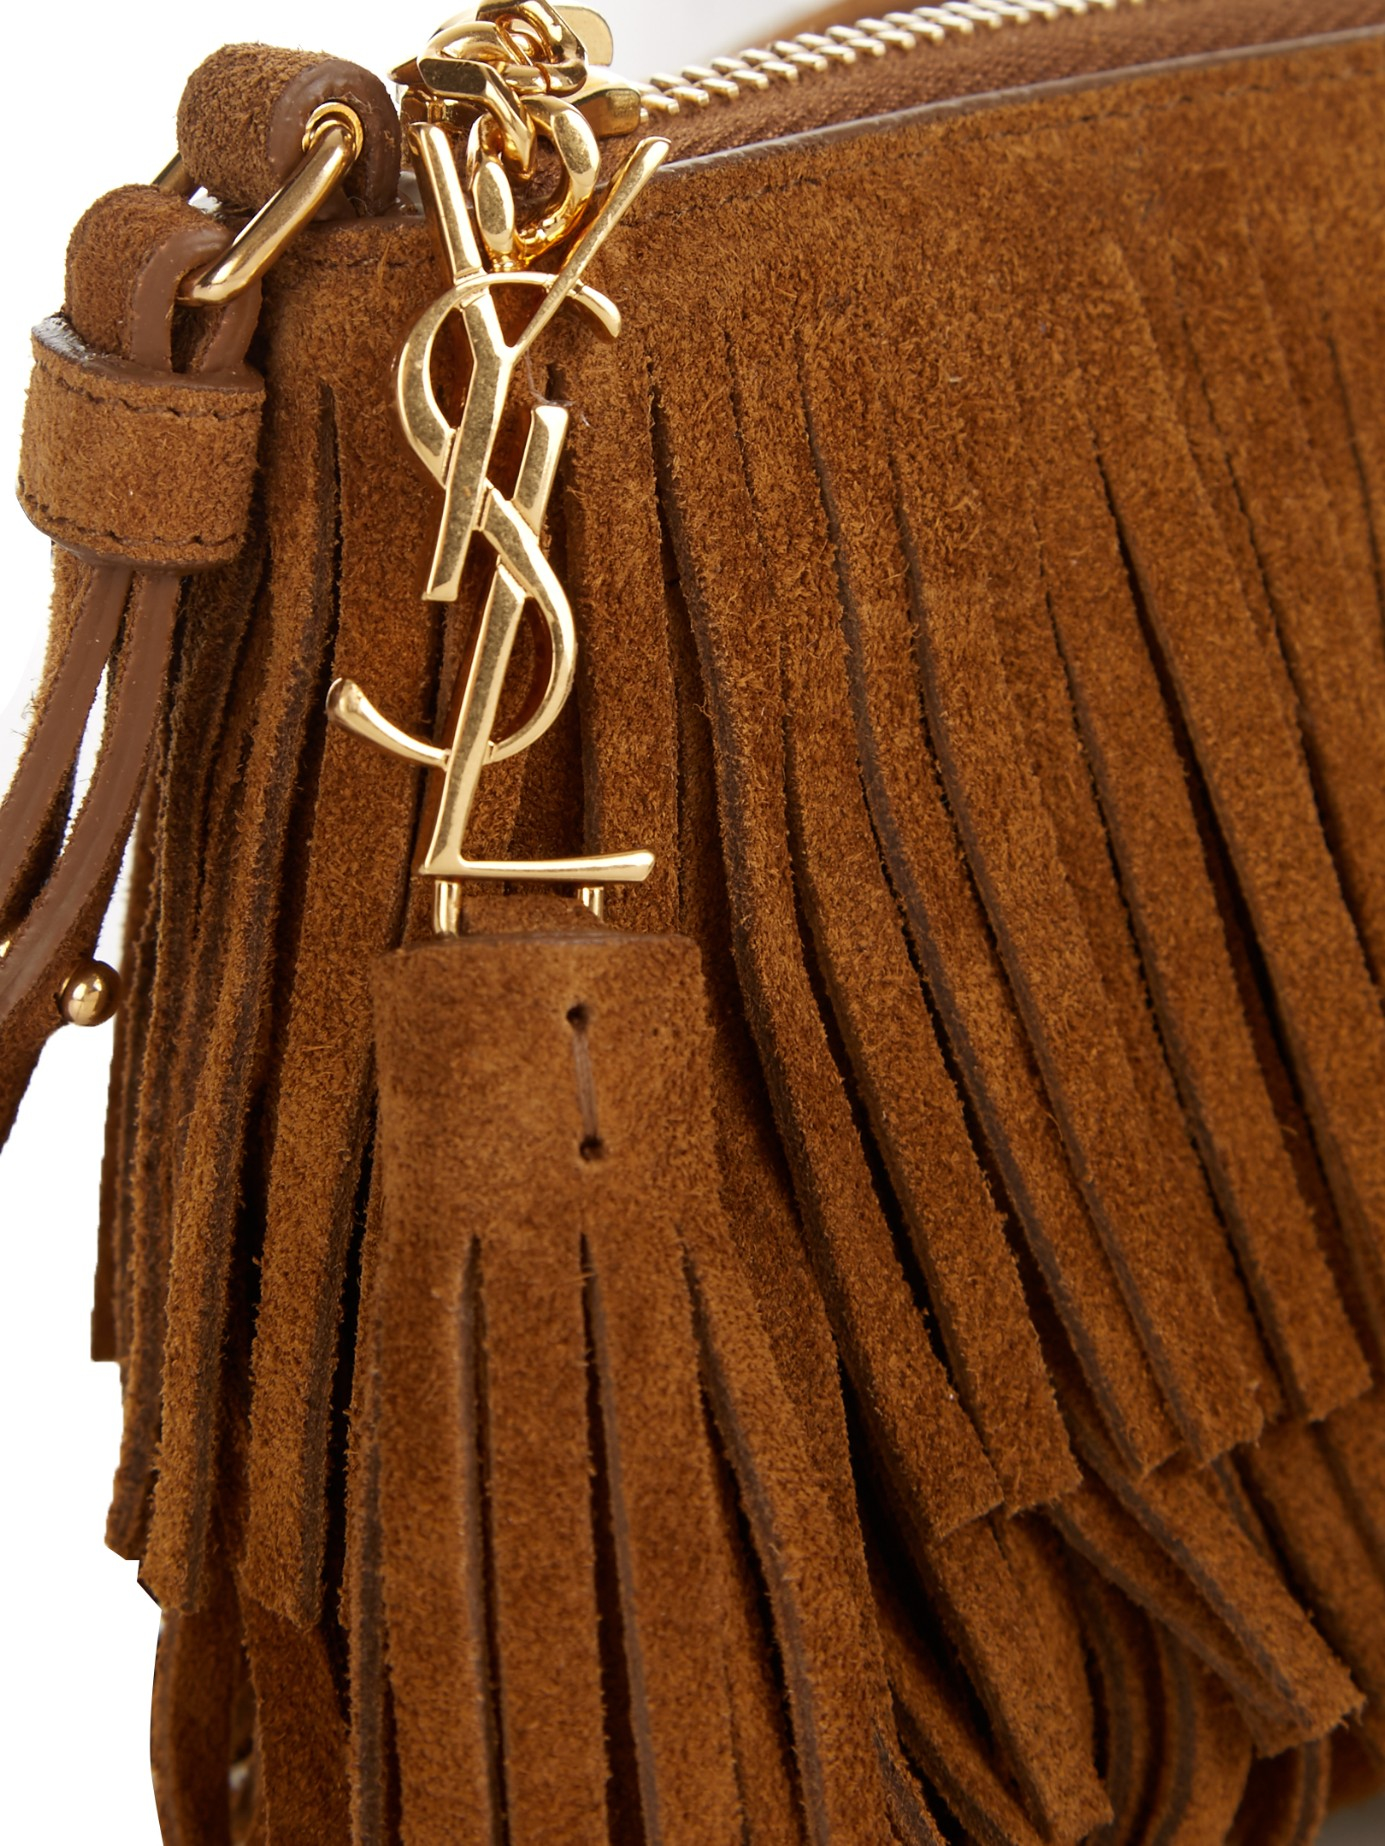 ysl black leather handbag - Small Monogram Saint Laurent Fringed Crossbody Bag In Brown Suede ...